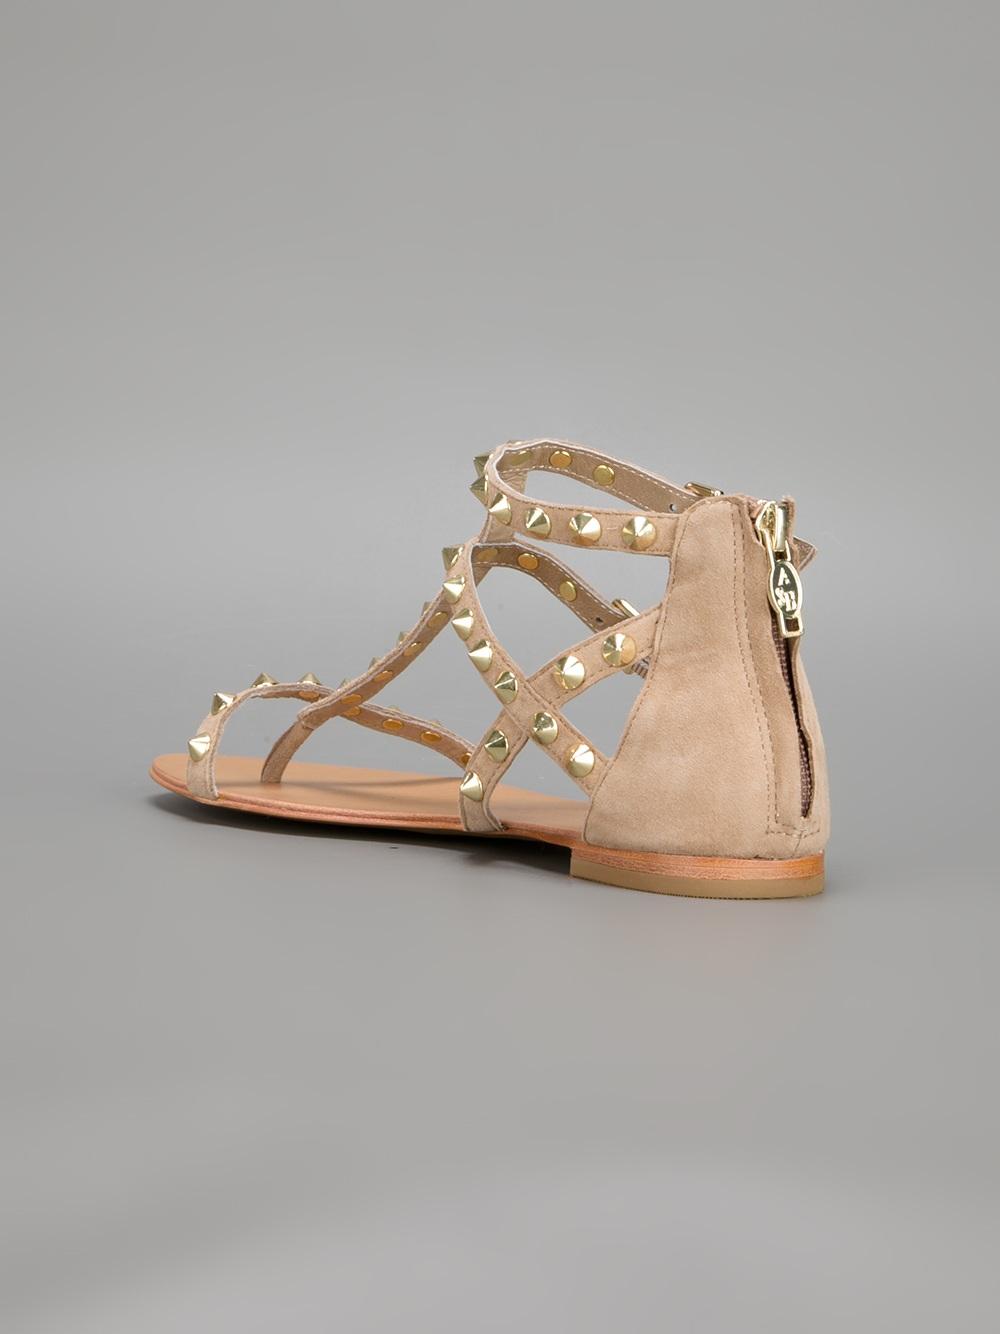 Ash Malibu Sandal In Natural - Lyst-3300